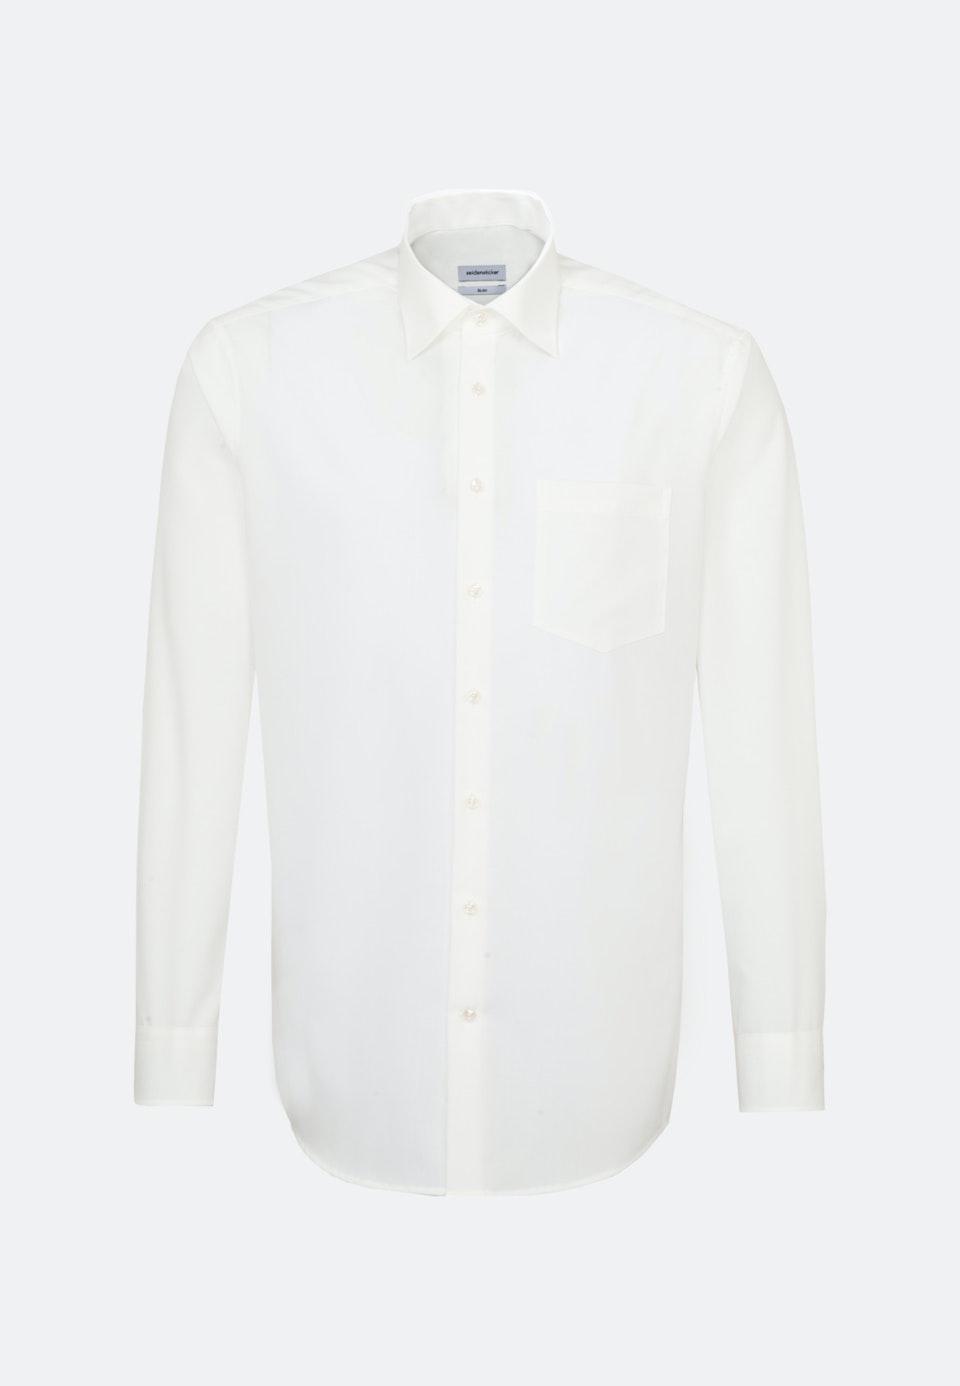 Bügelfreies Popeline Business Hemd in Regular mit Kentkragen in Ecru |  Seidensticker Onlineshop